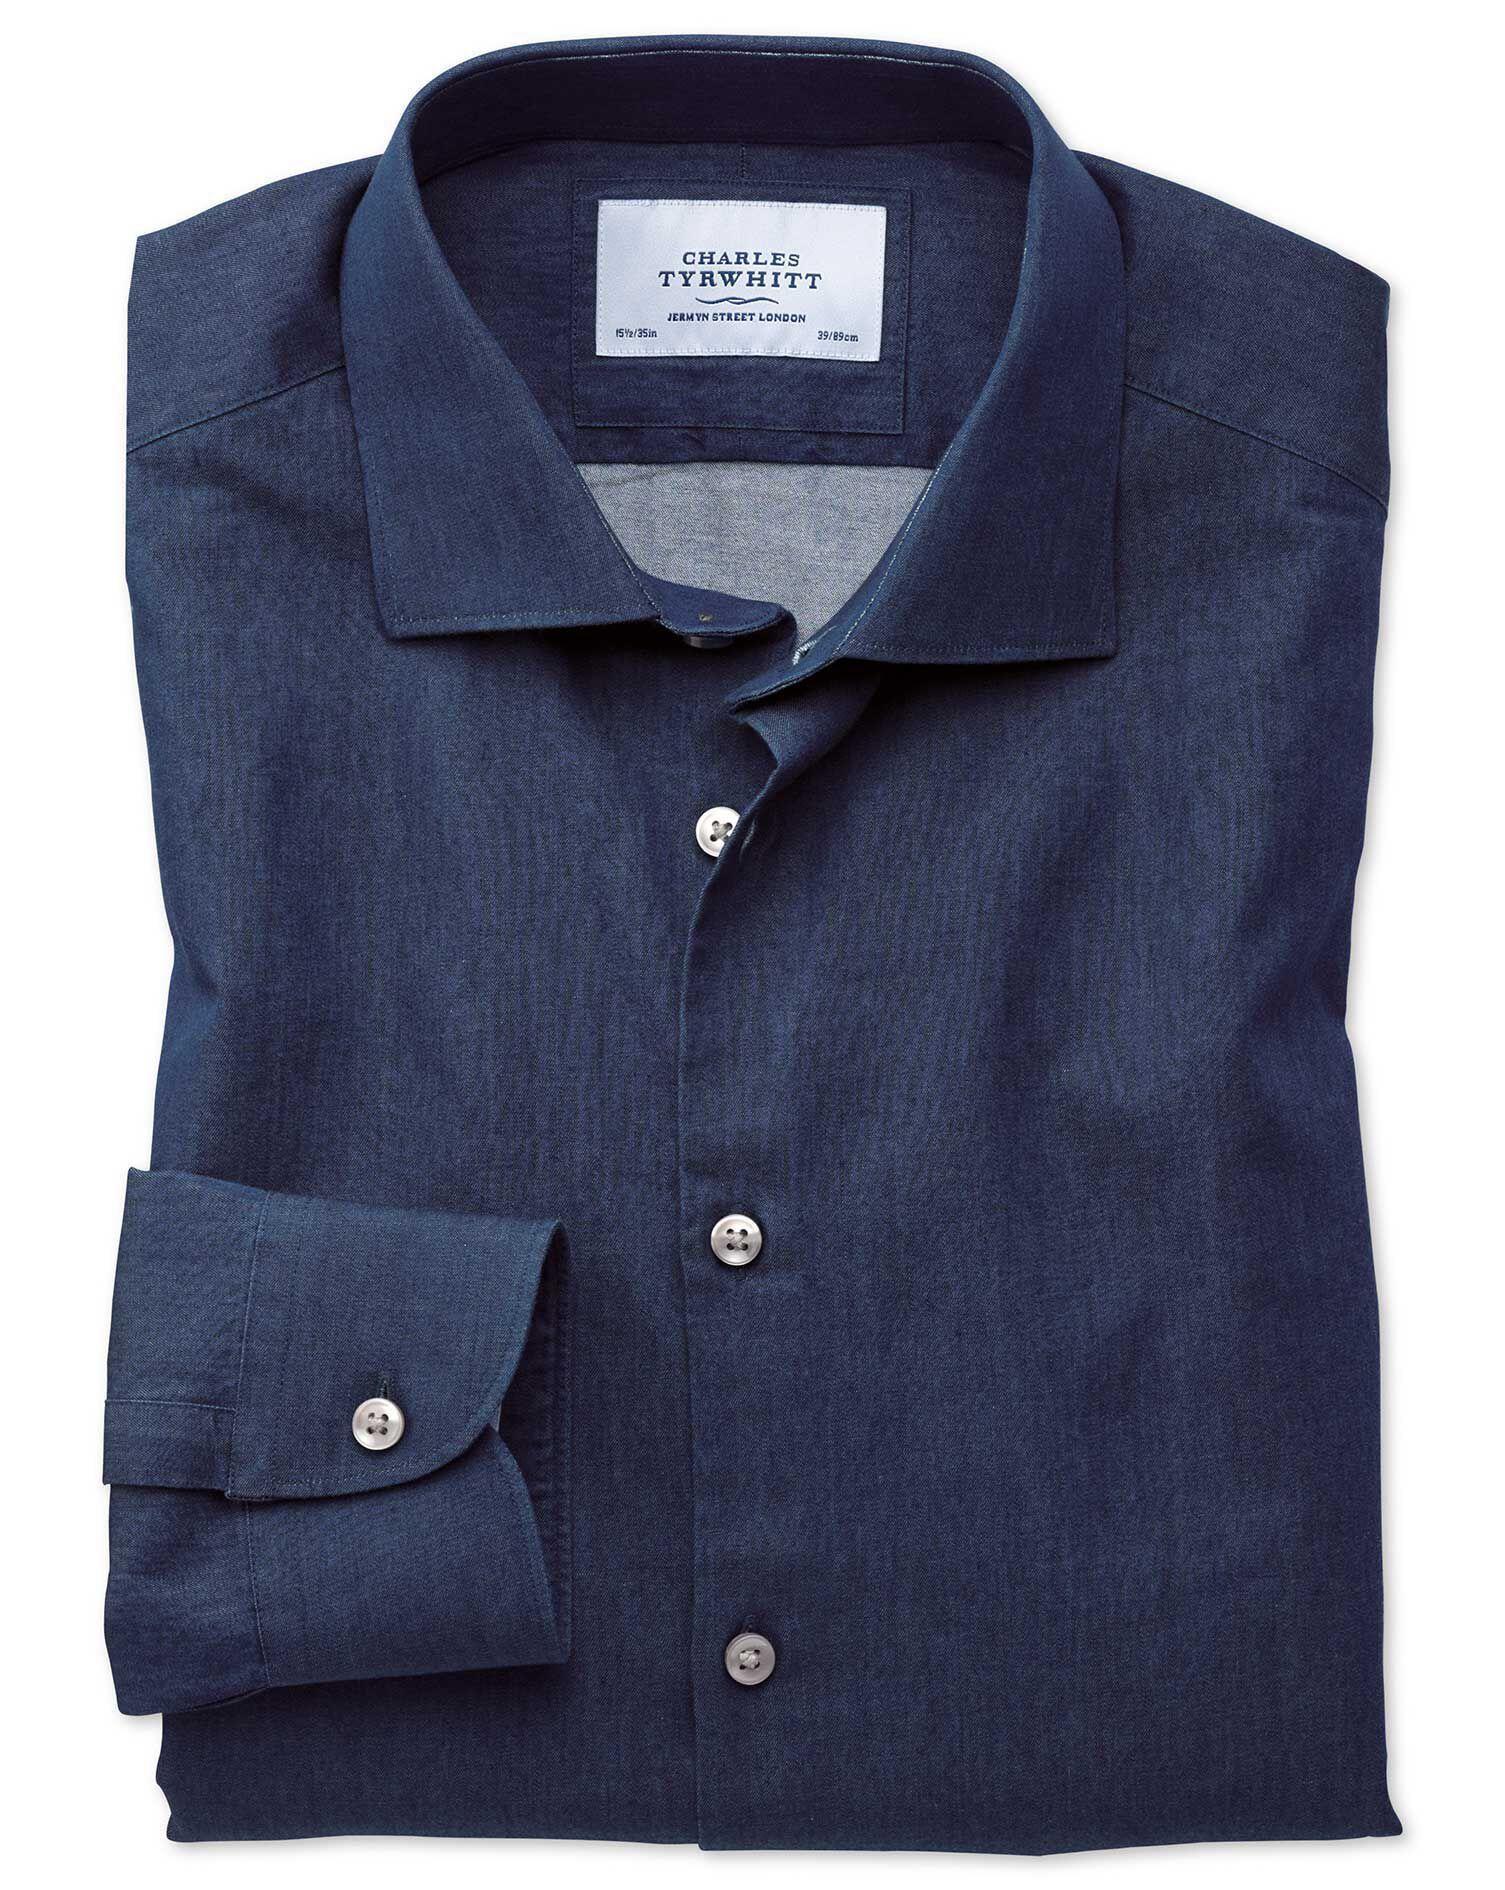 Extra Slim Fit Semi-Cutaway Business Casual Indigo Dark Blue Cotton Formal Shirt Single Cuff Size 17